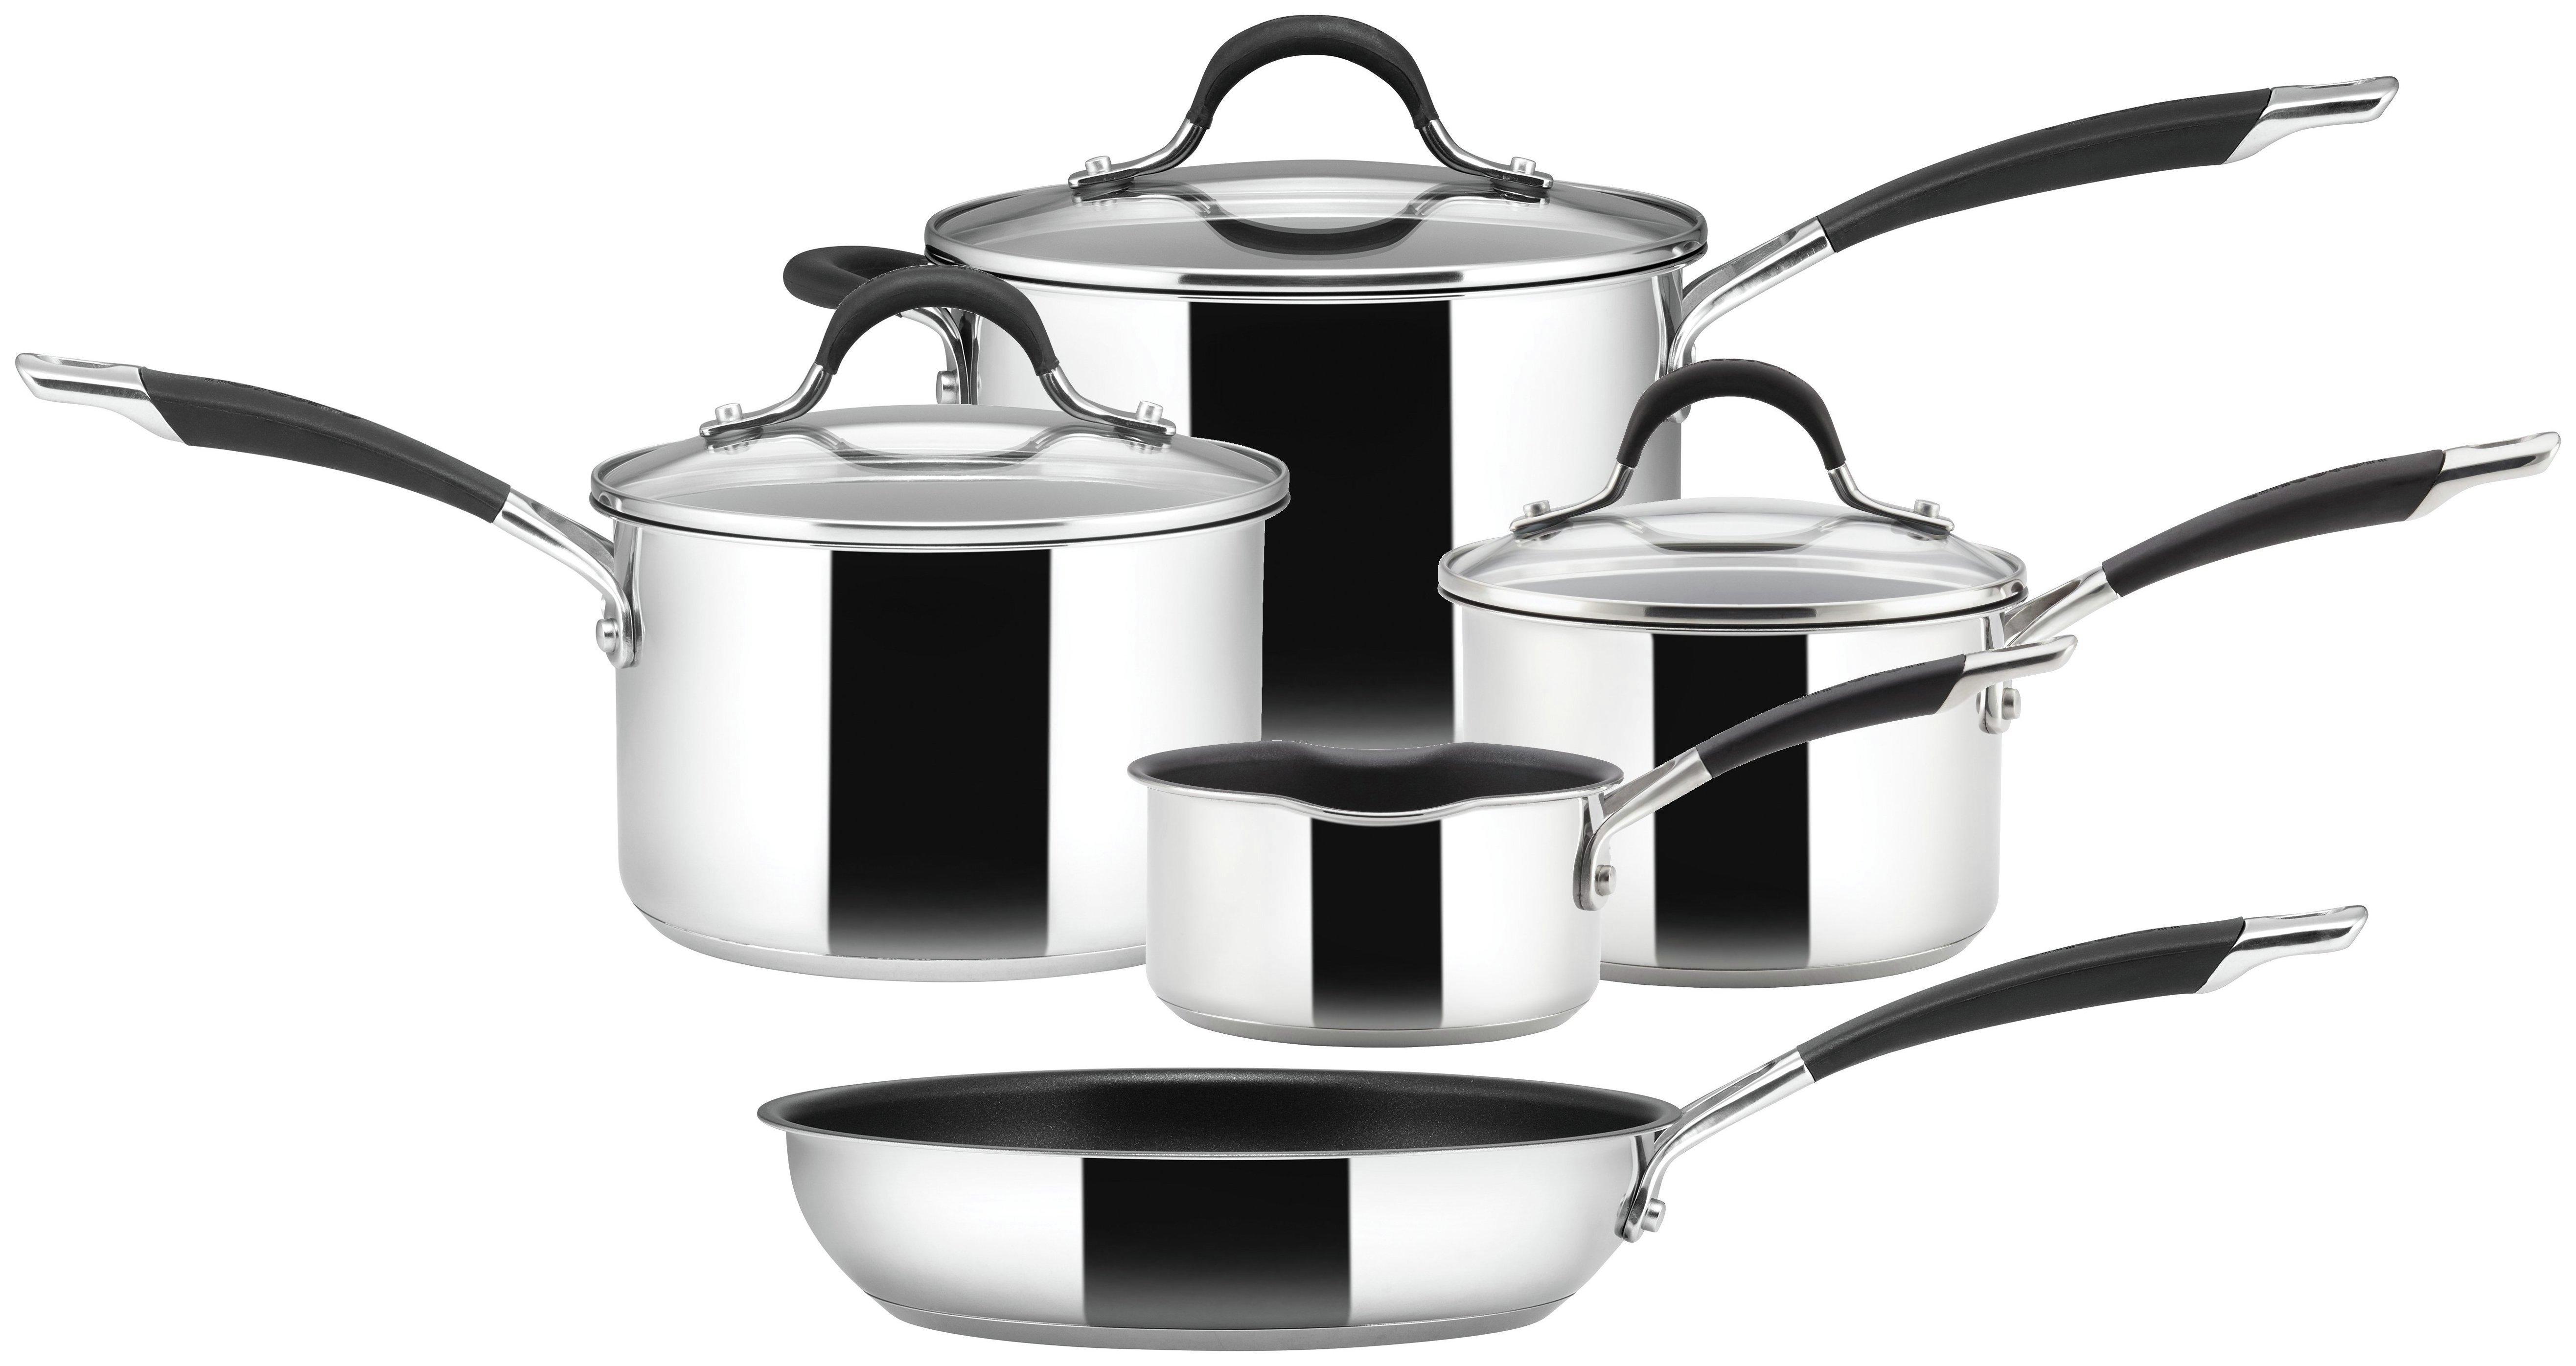 Image of Circulon Momentum - 5 Piece Stainless Steel Pan Set